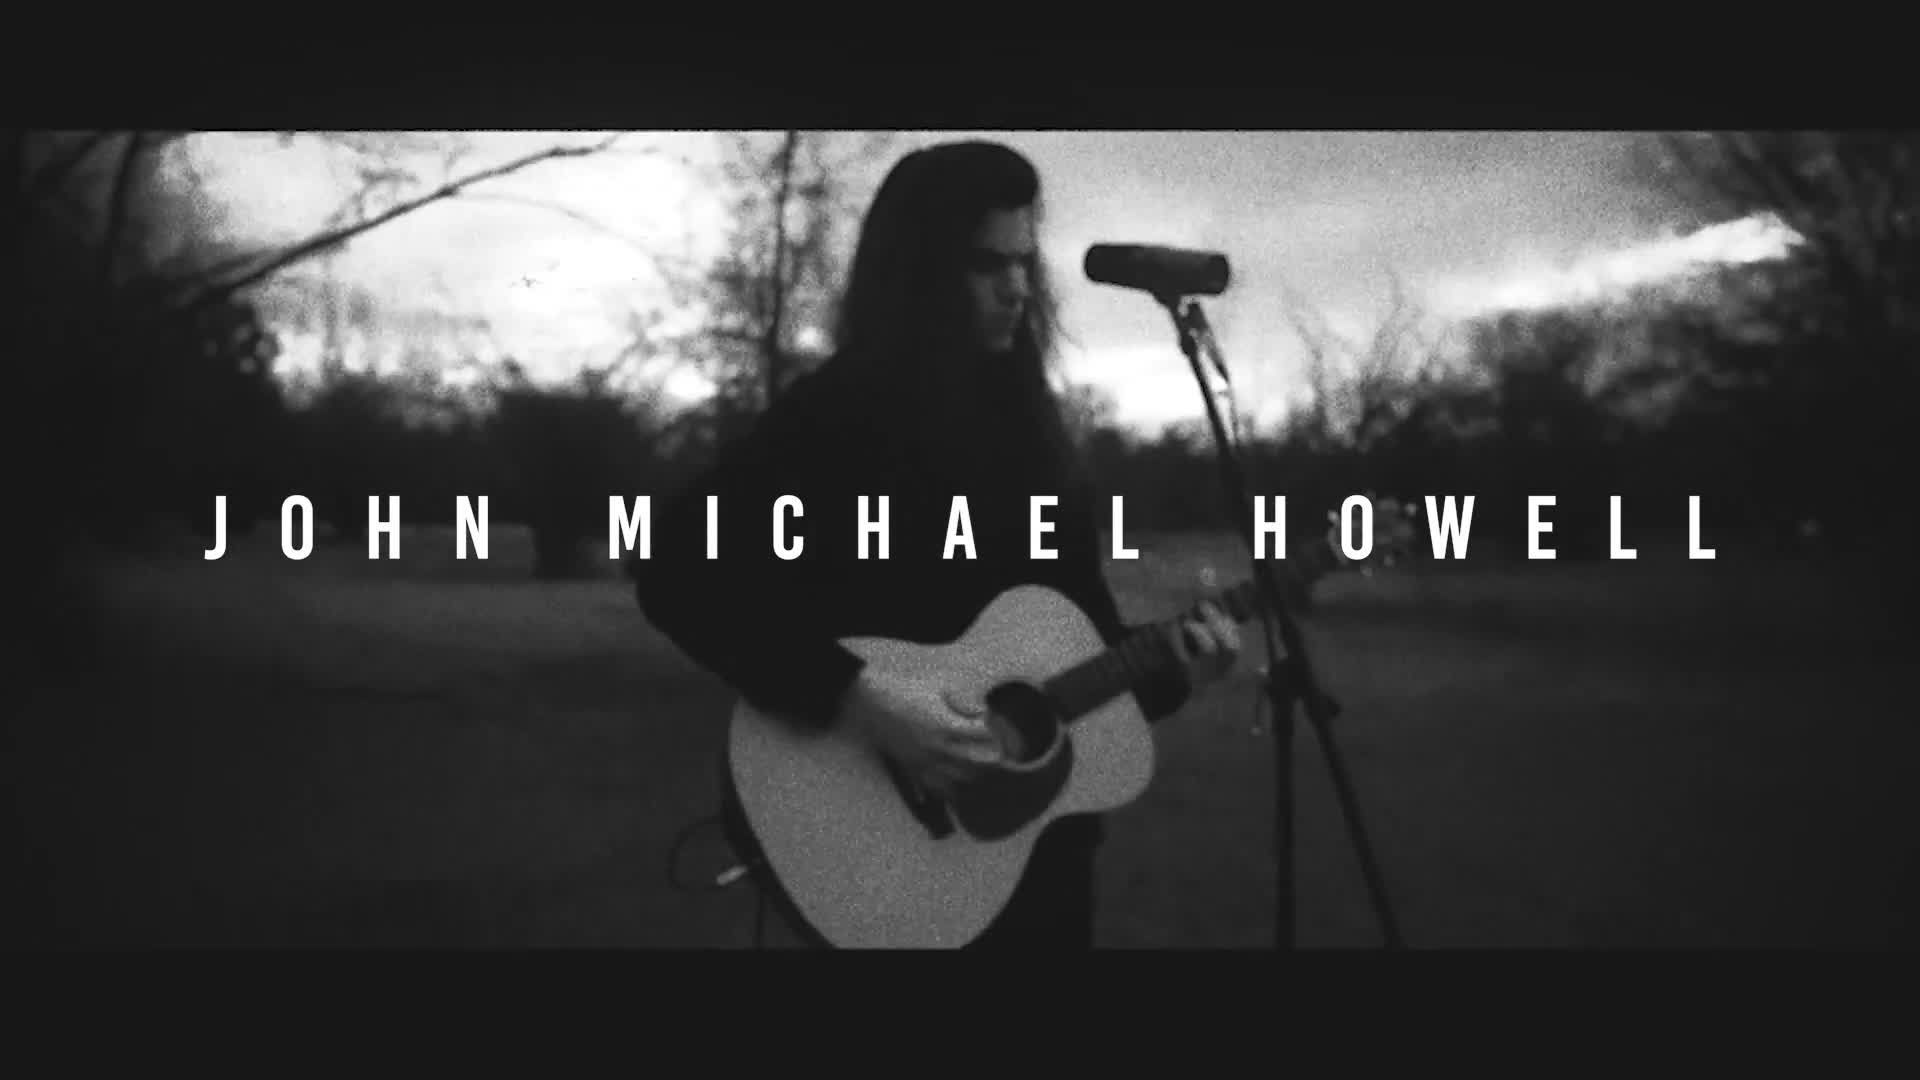 John Michael Howell-BREATHE LIVE TAKE - Official Music Video